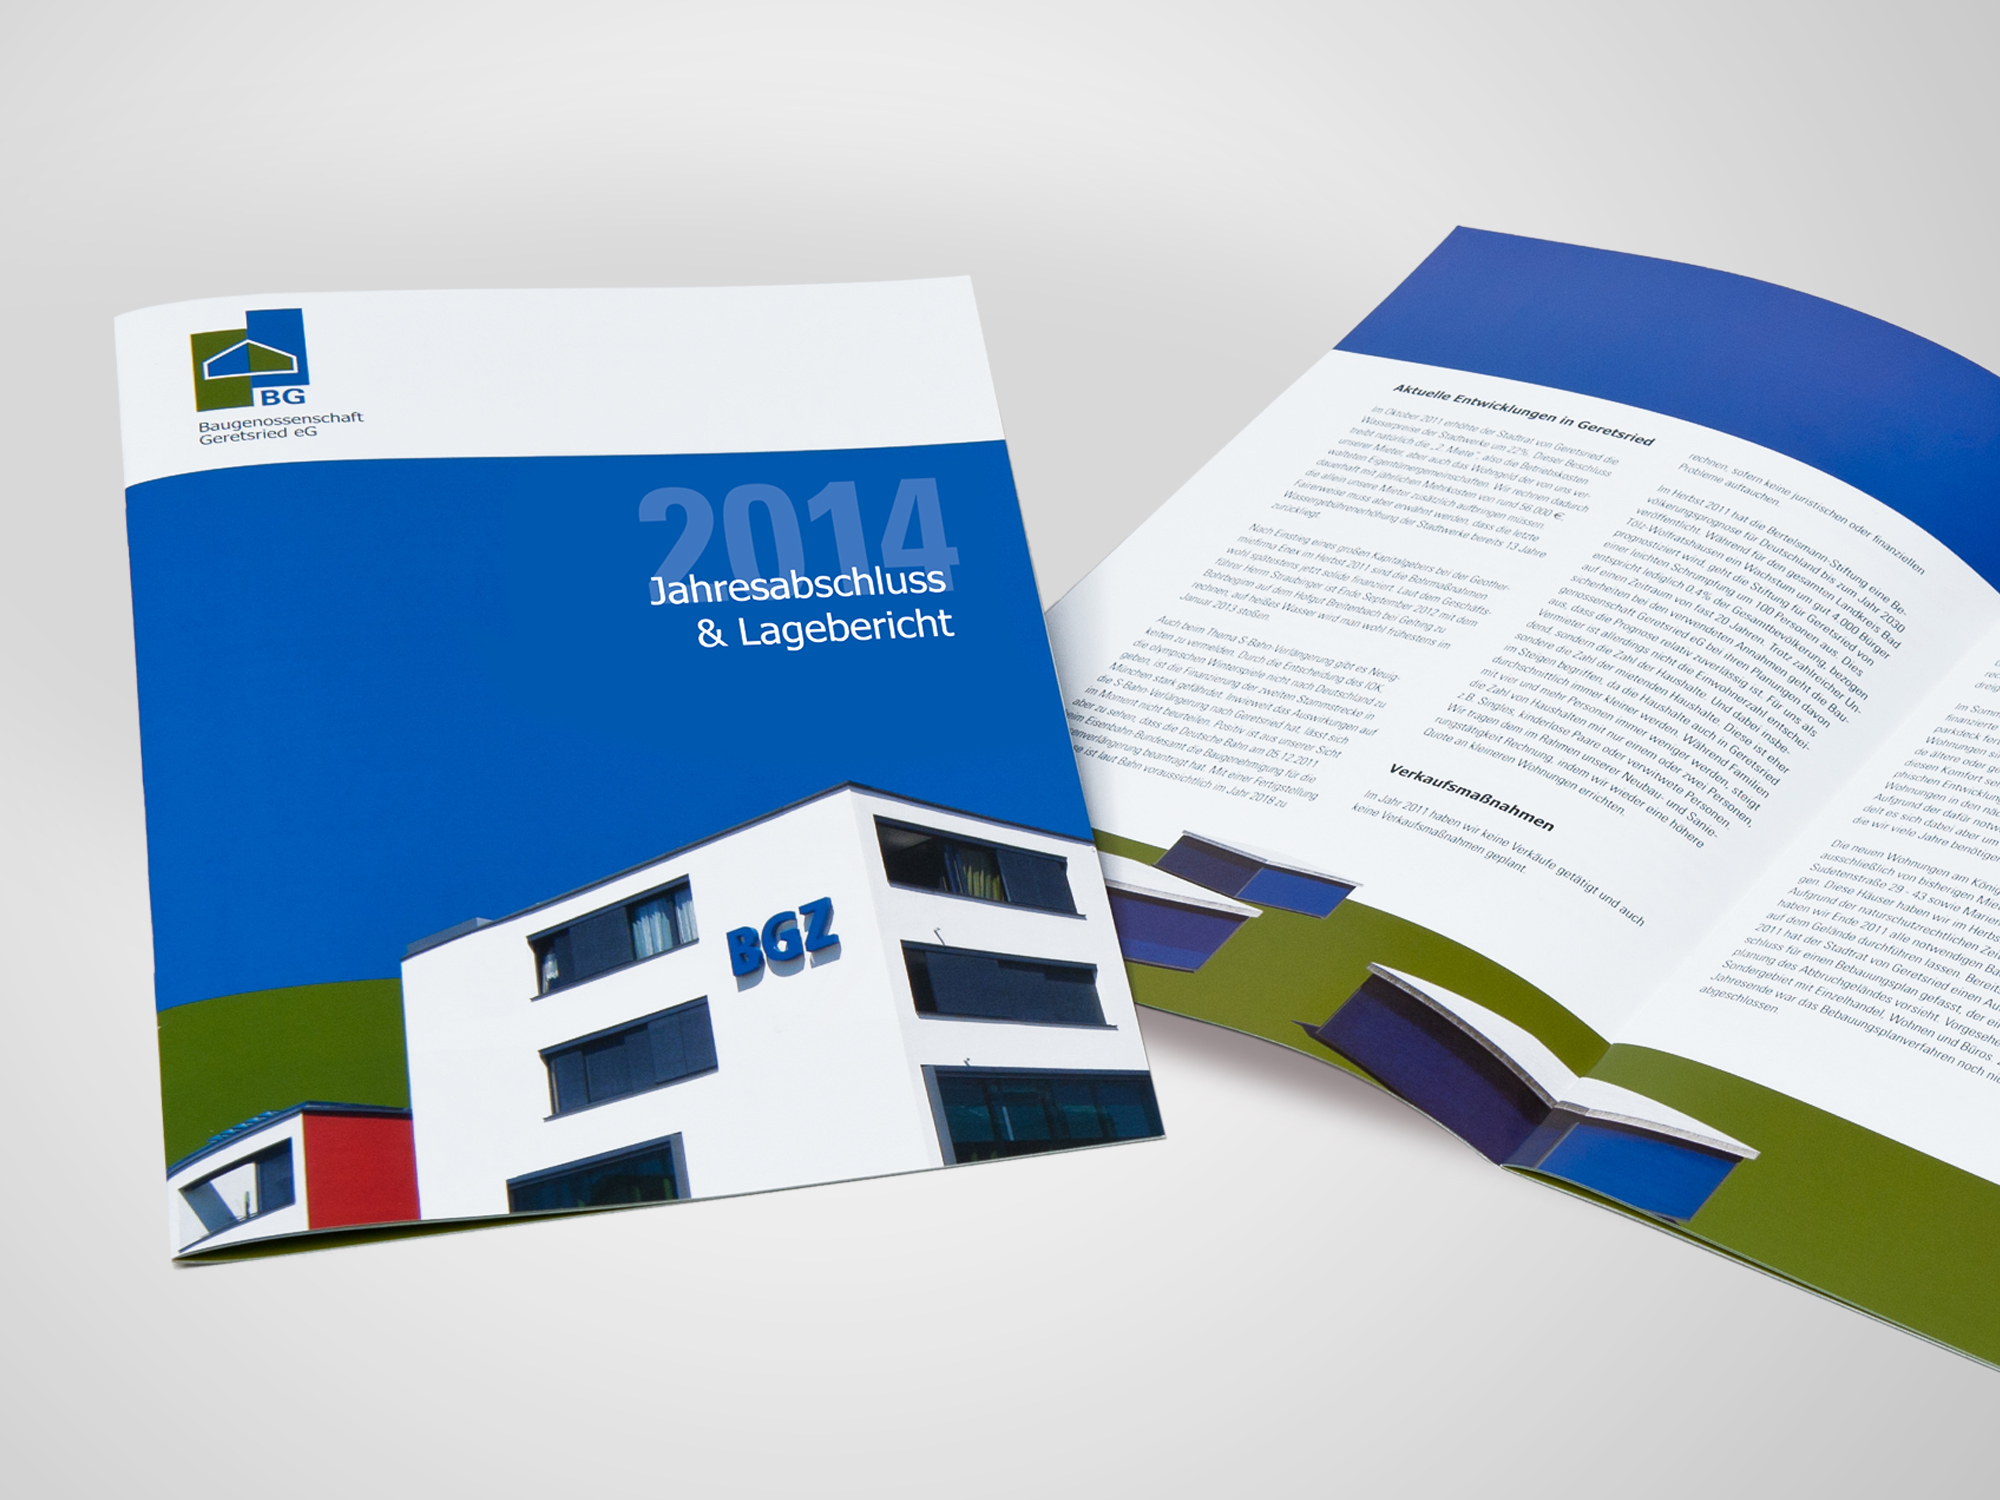 Broschuere-Folder-Gestaltung-BGZ